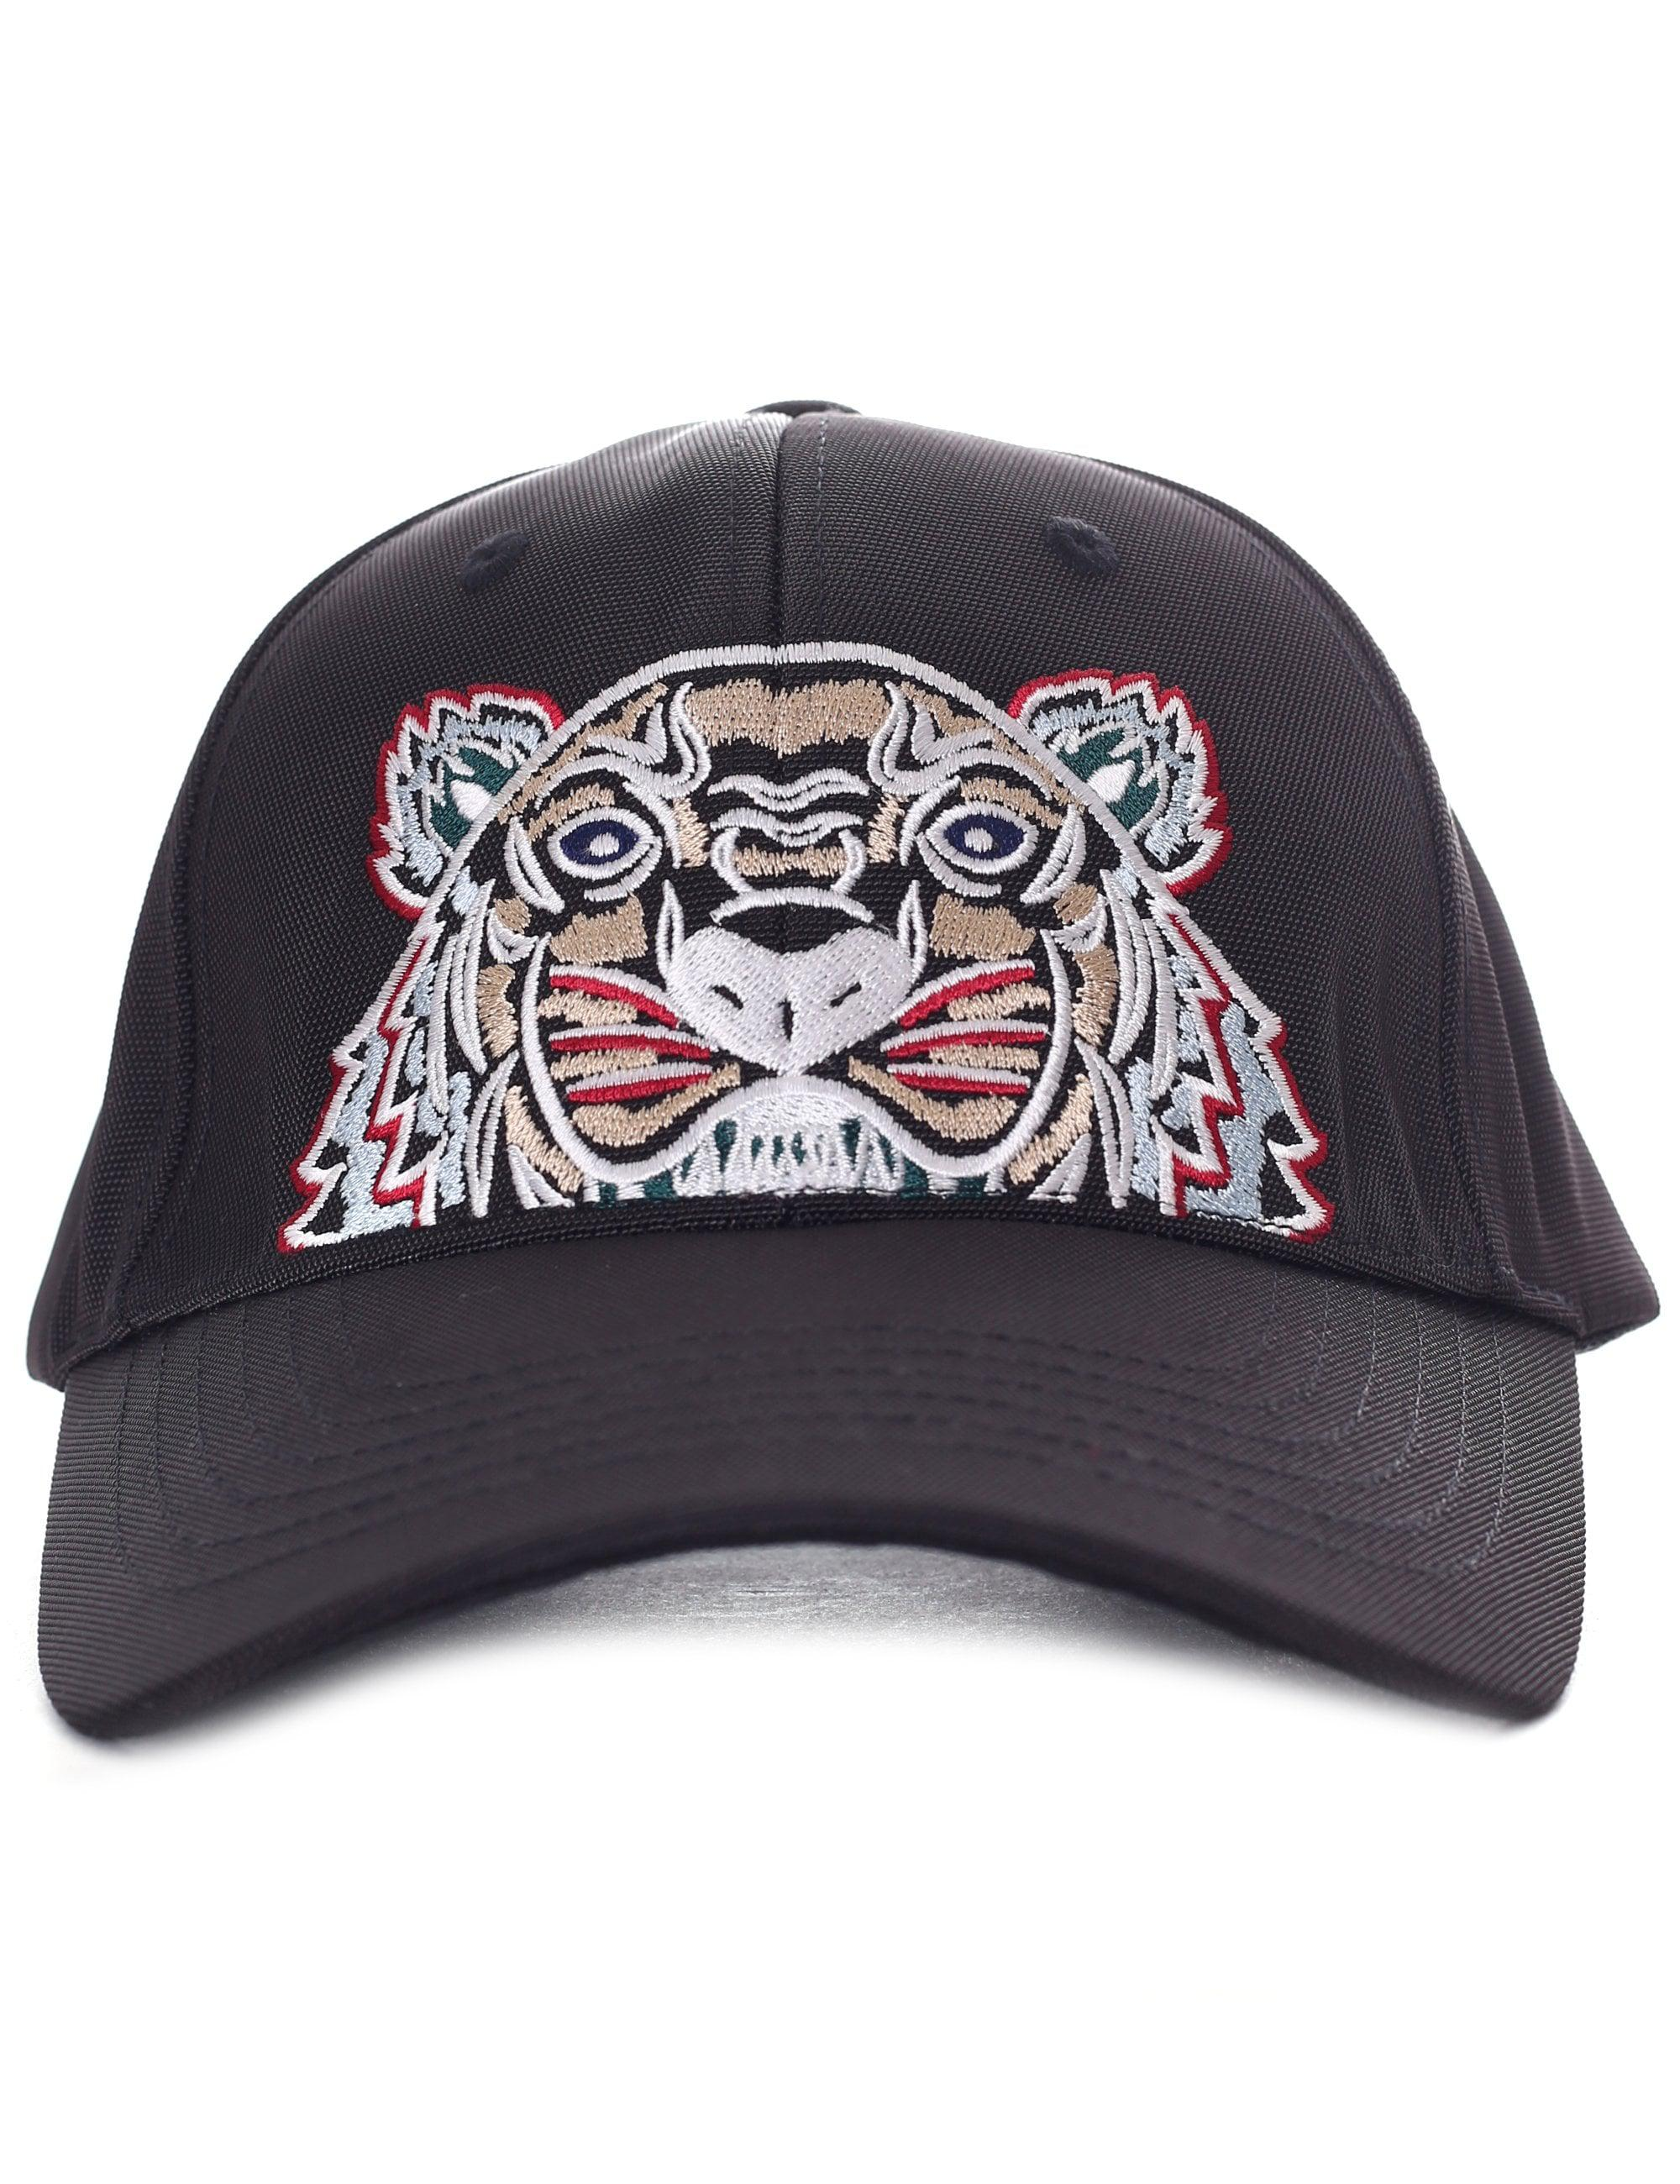 KENZO Men s Tiger Canvas Cap Black in Black for Men - Save 42% - Lyst b8c079d512ef